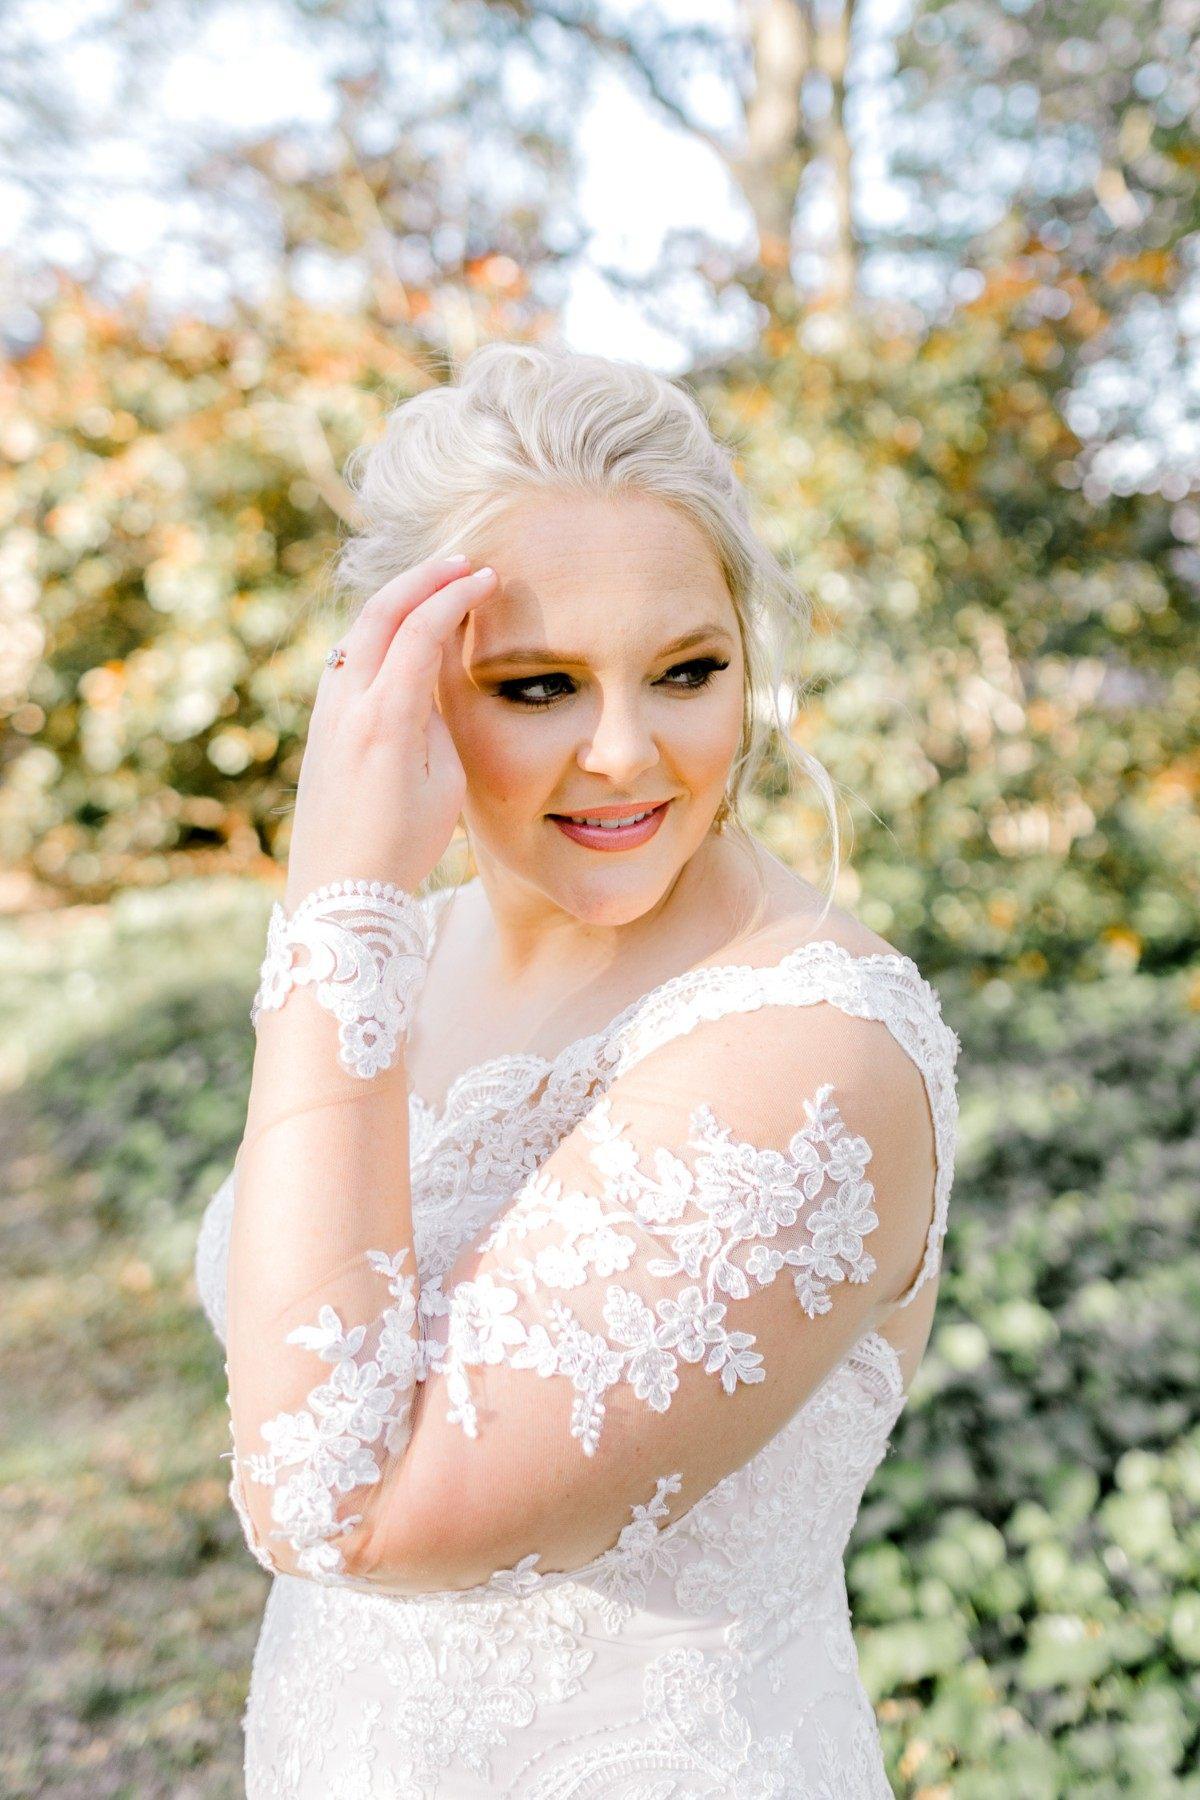 casidy-bridals-tradinghouse-lake-waco-wedding-photographer-kaitlyn-bullard-03.jpg